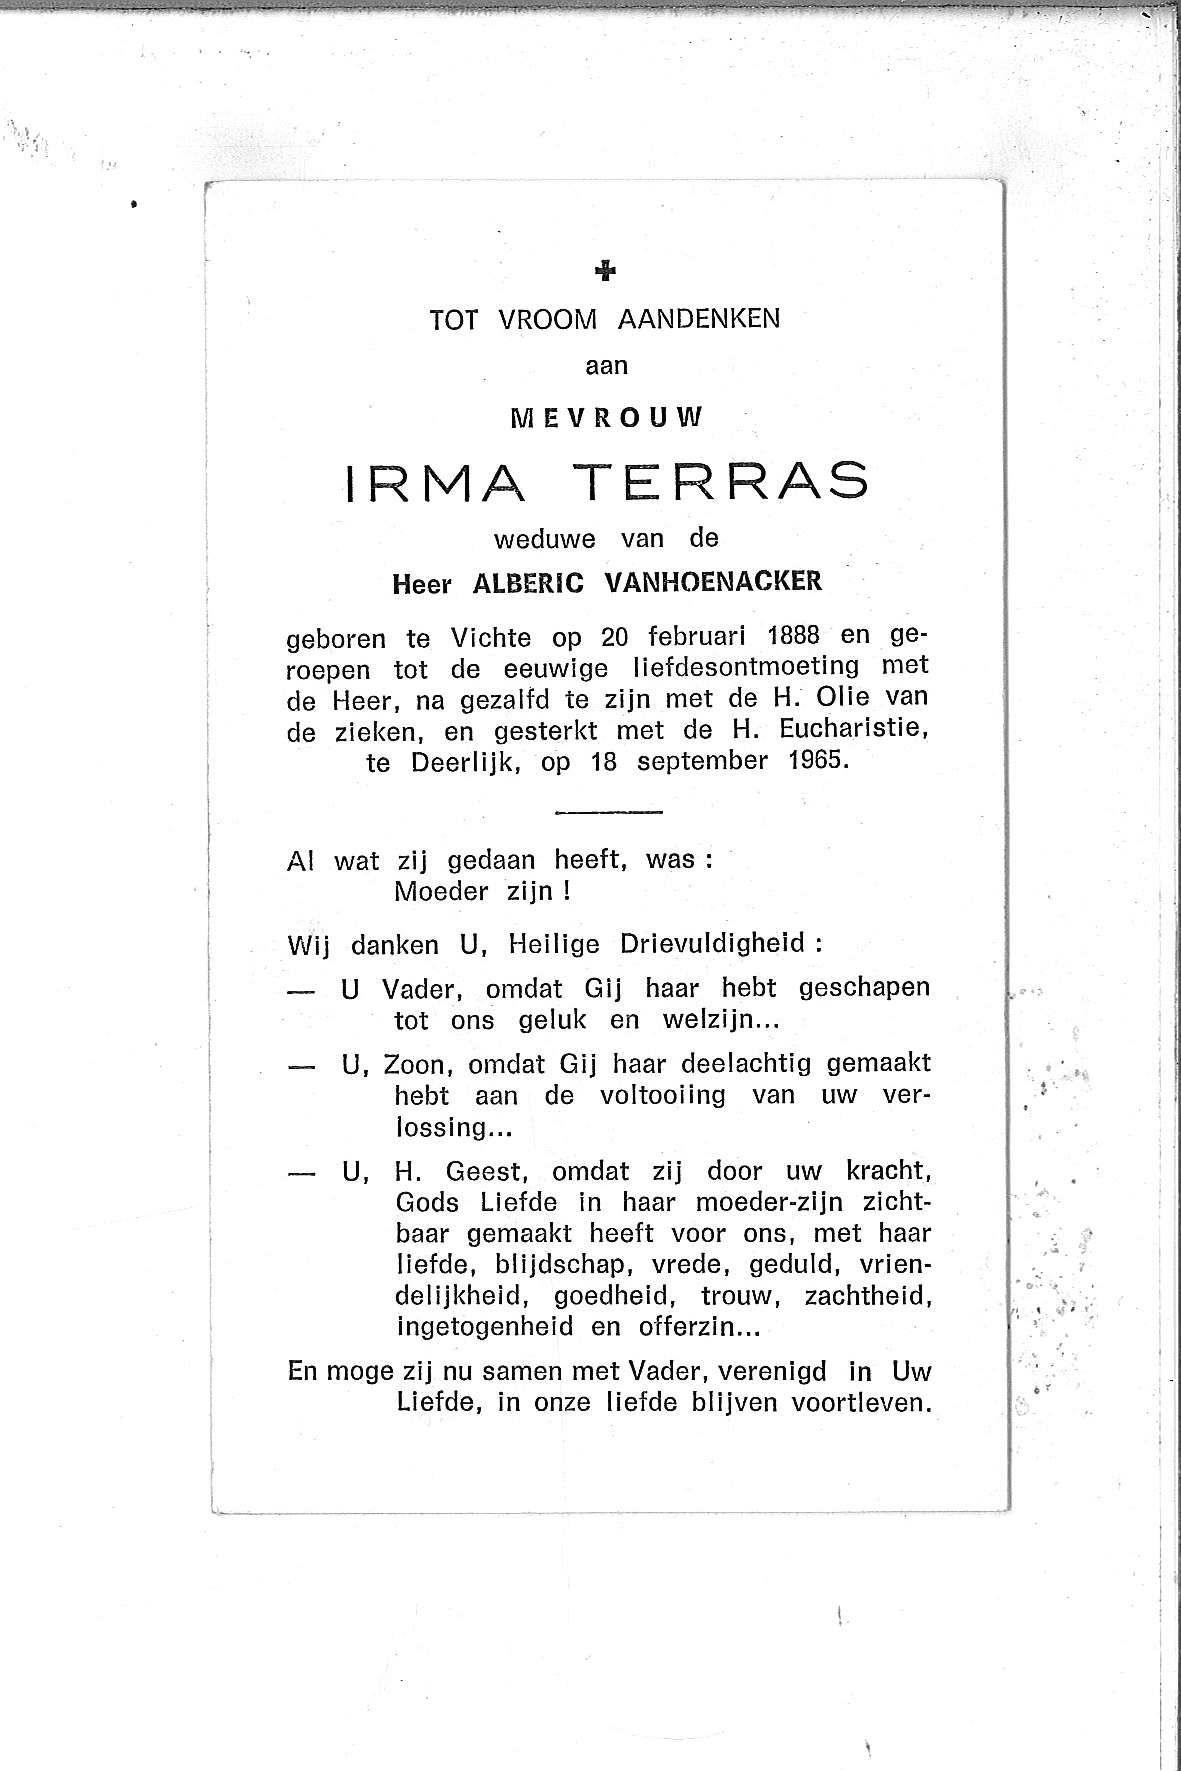 Irma(1965)20140806084036_00033.jpg